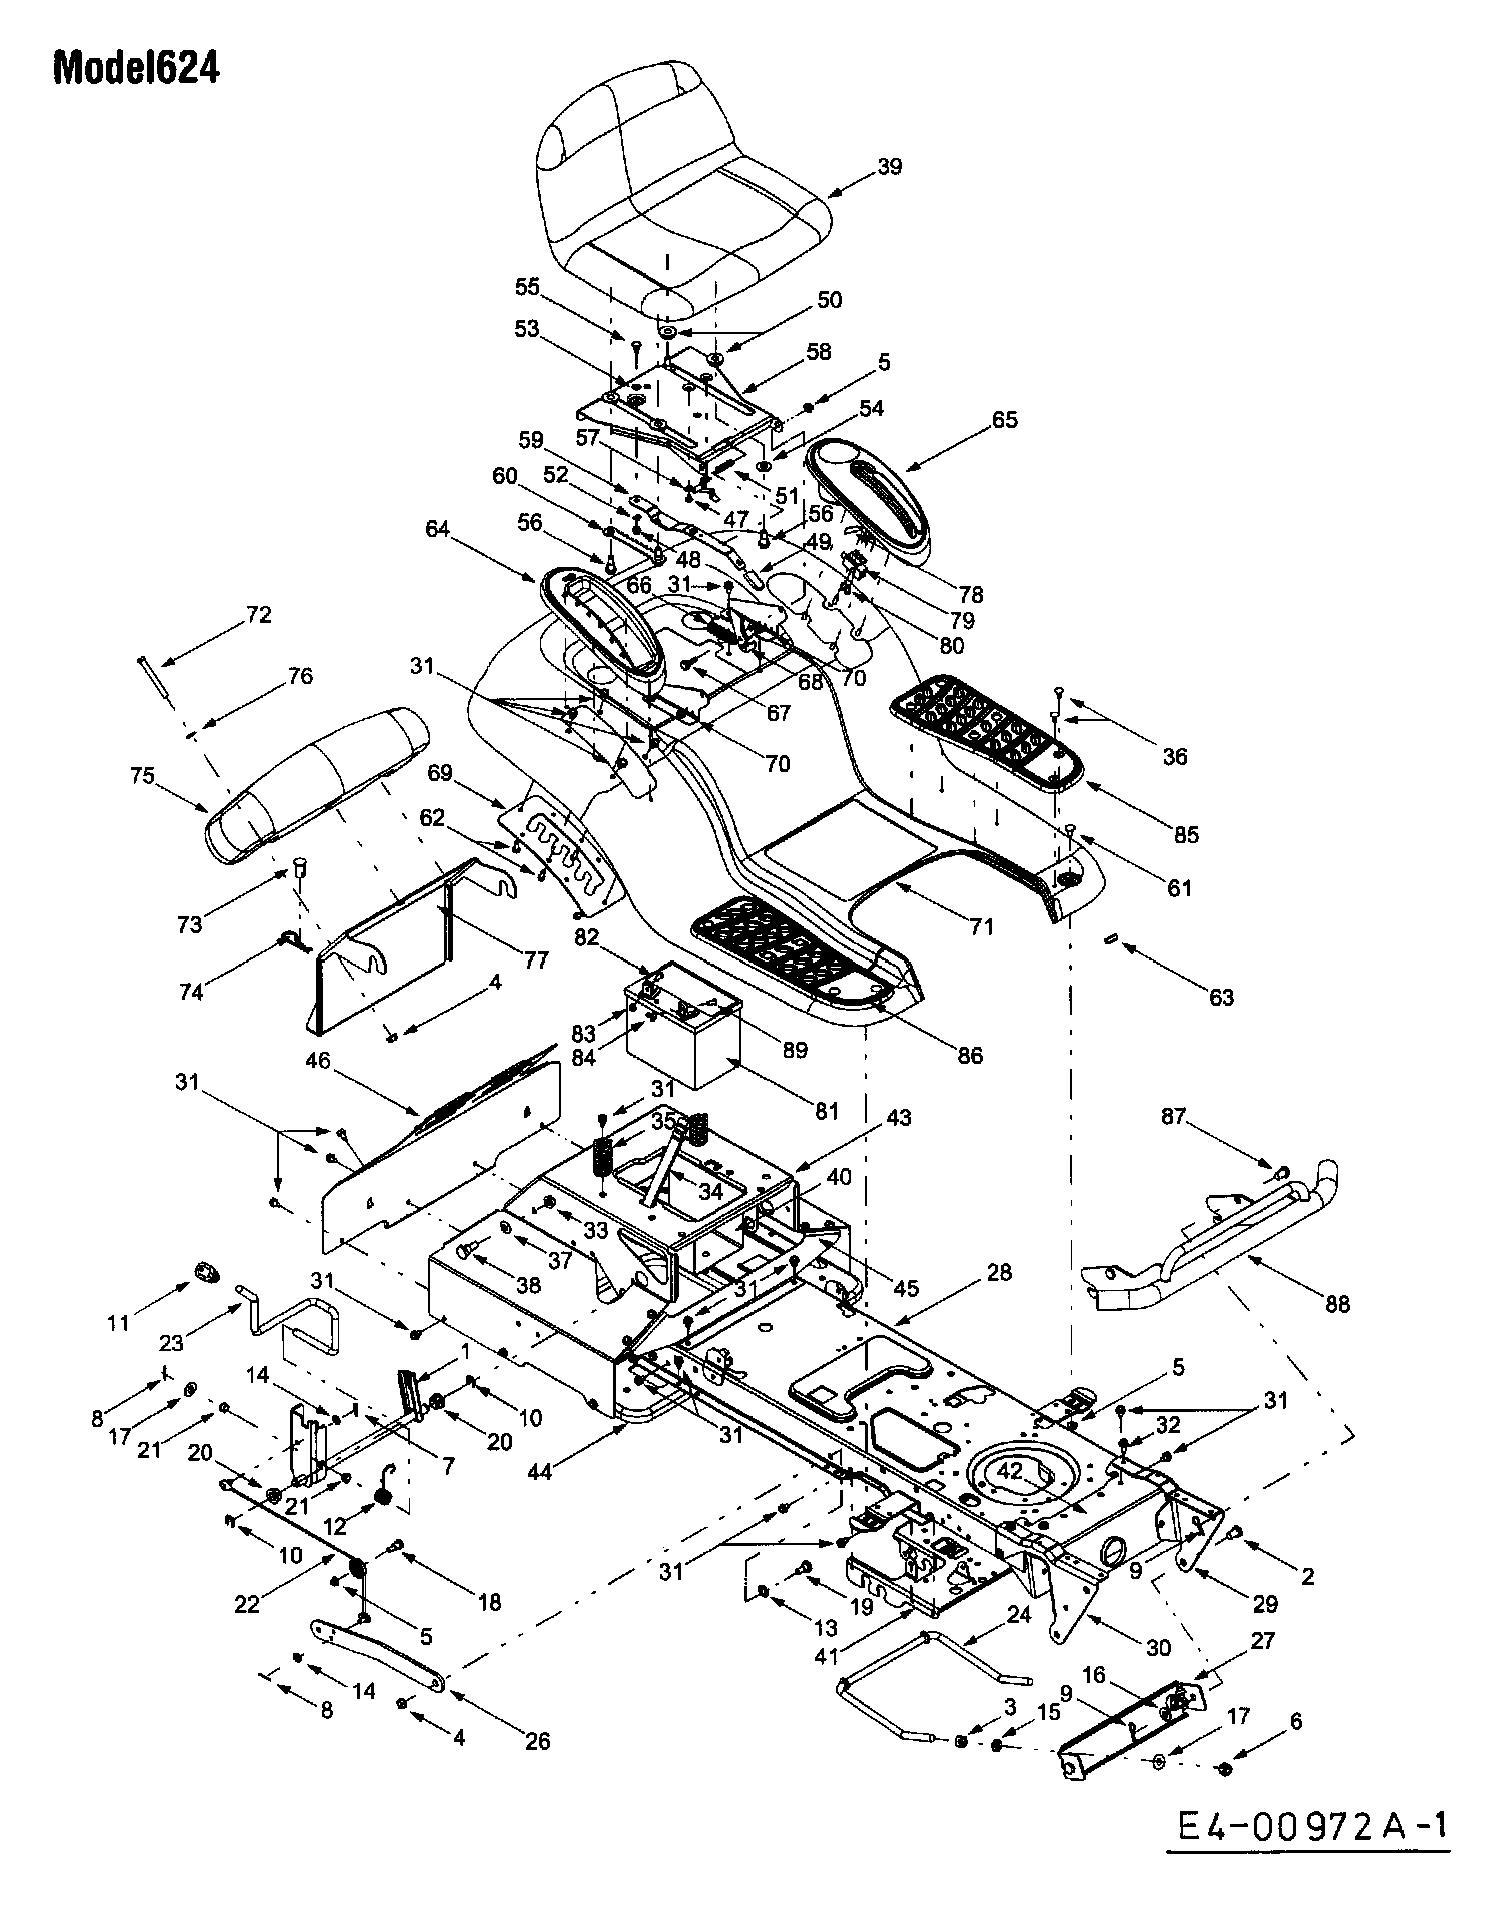 1983 nissan 280zx vacuum diagram  nissan  auto wiring diagram